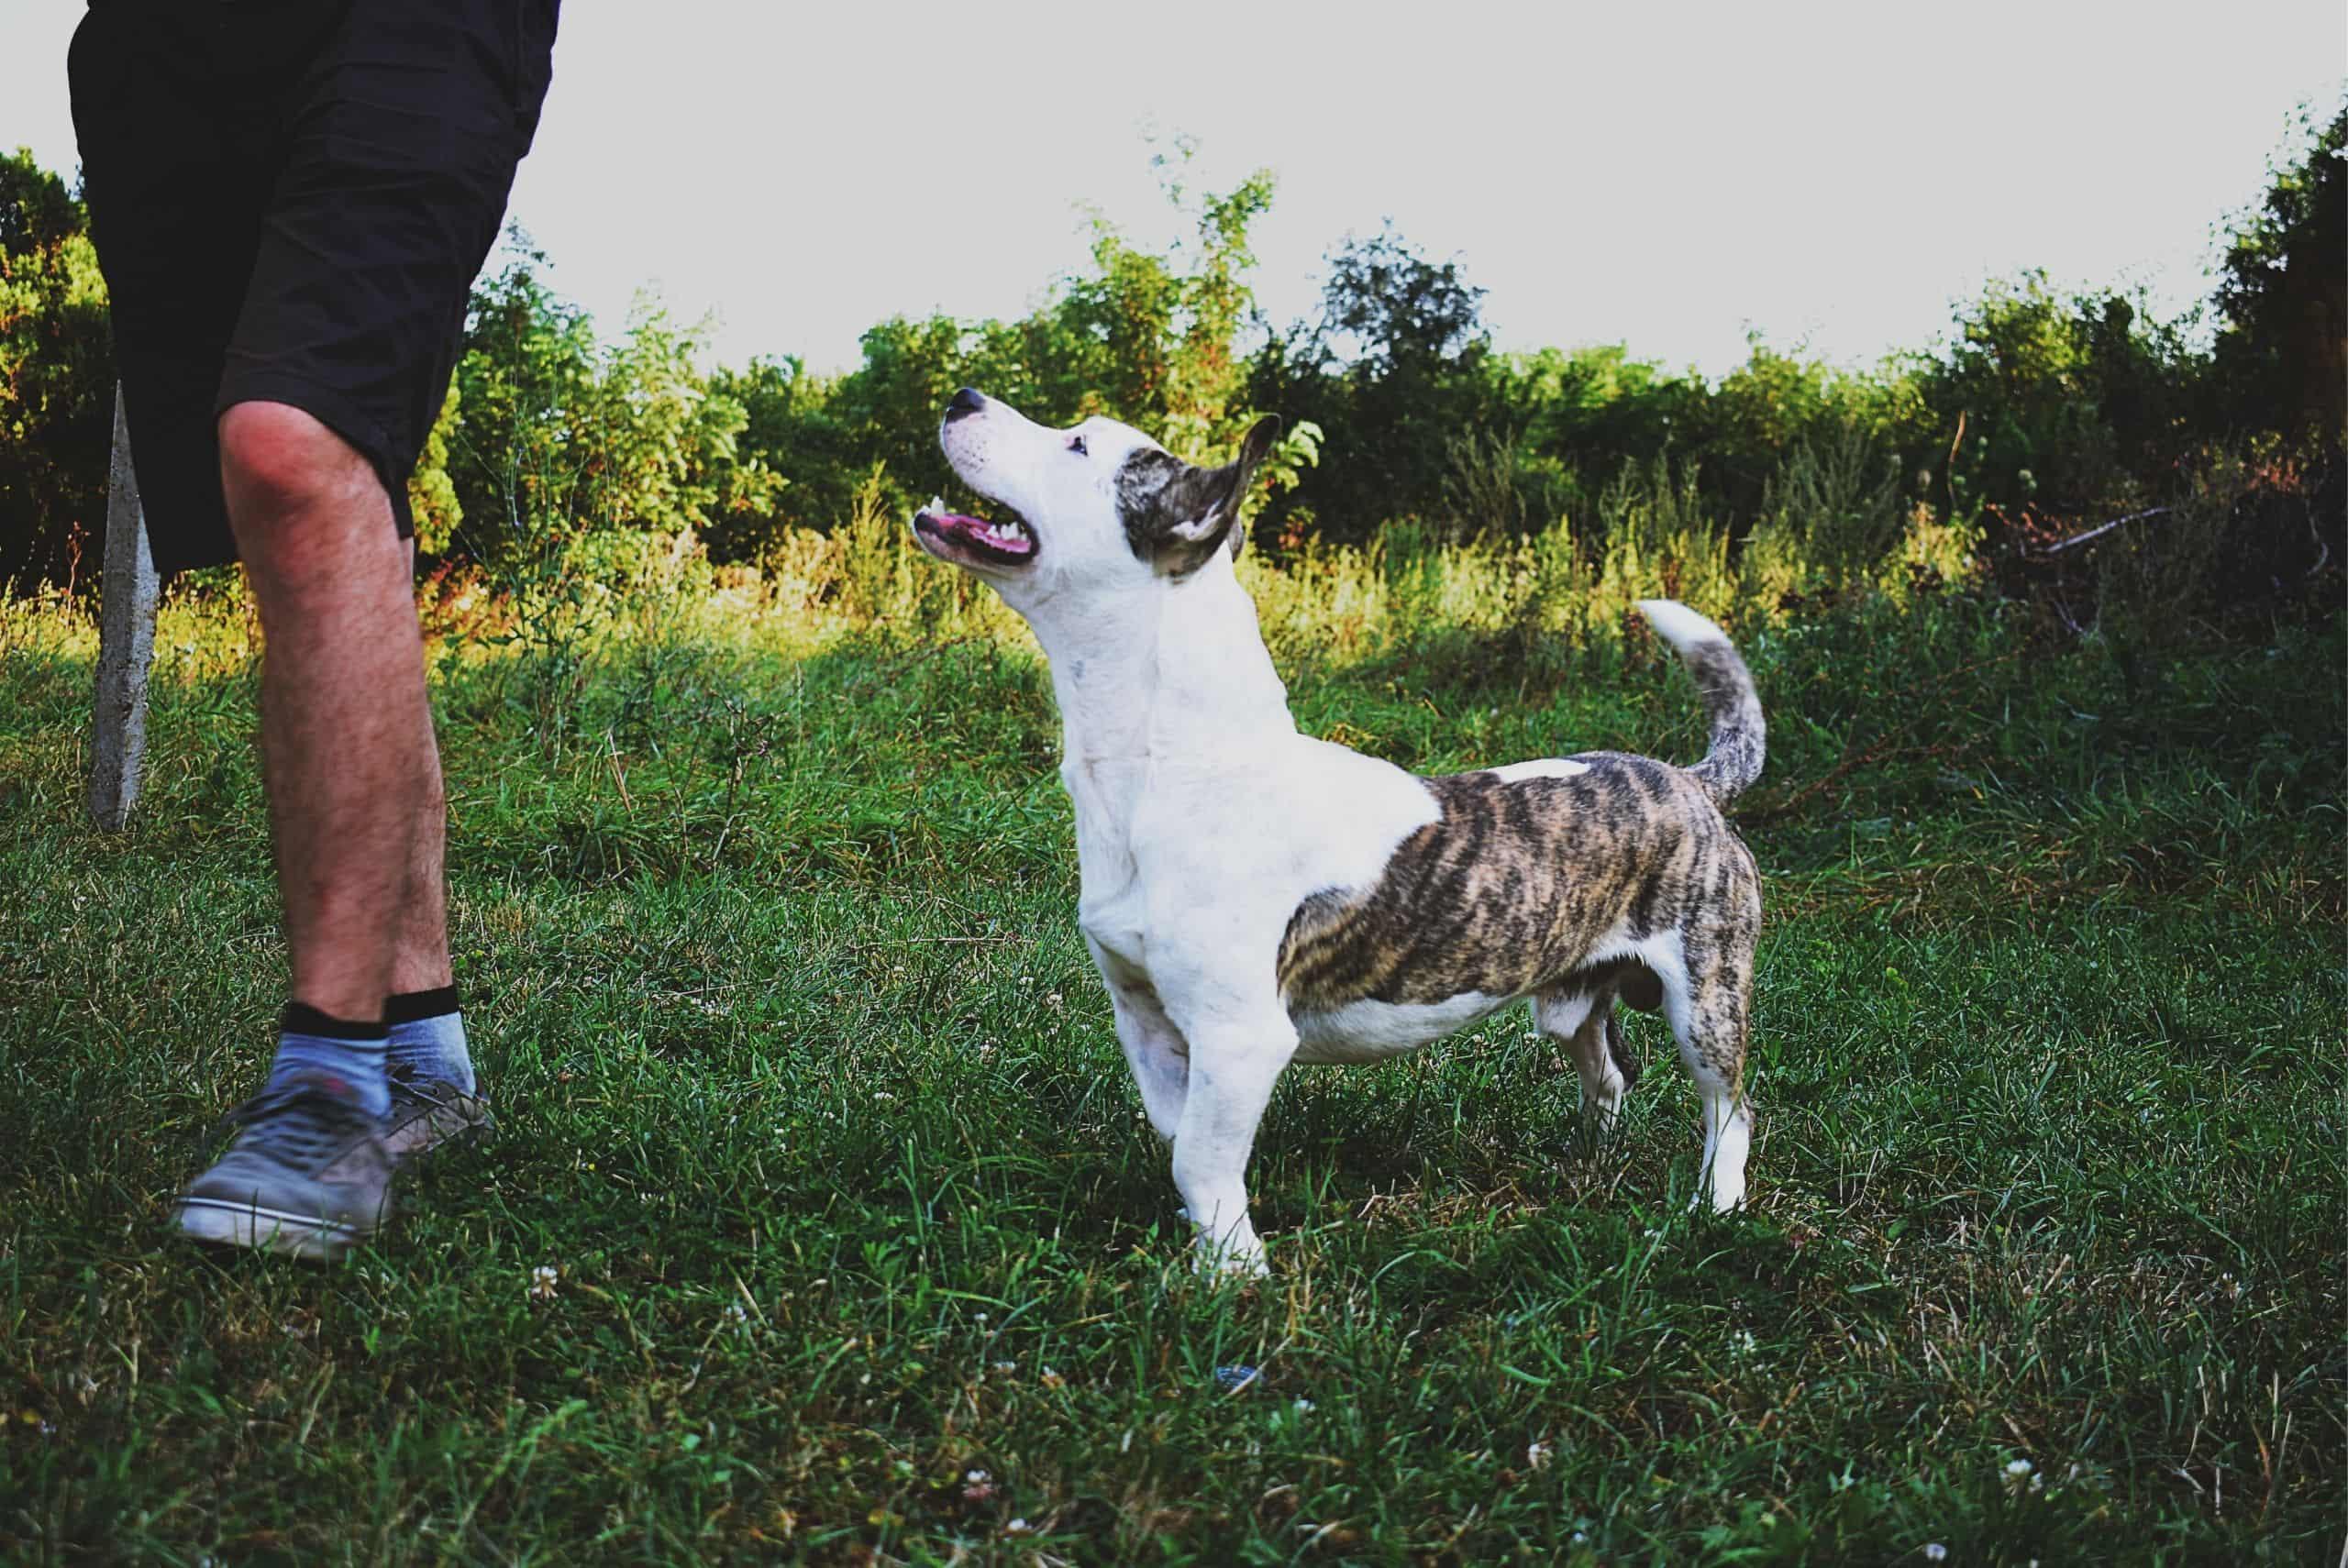 train-your-dog-off-leash-recall